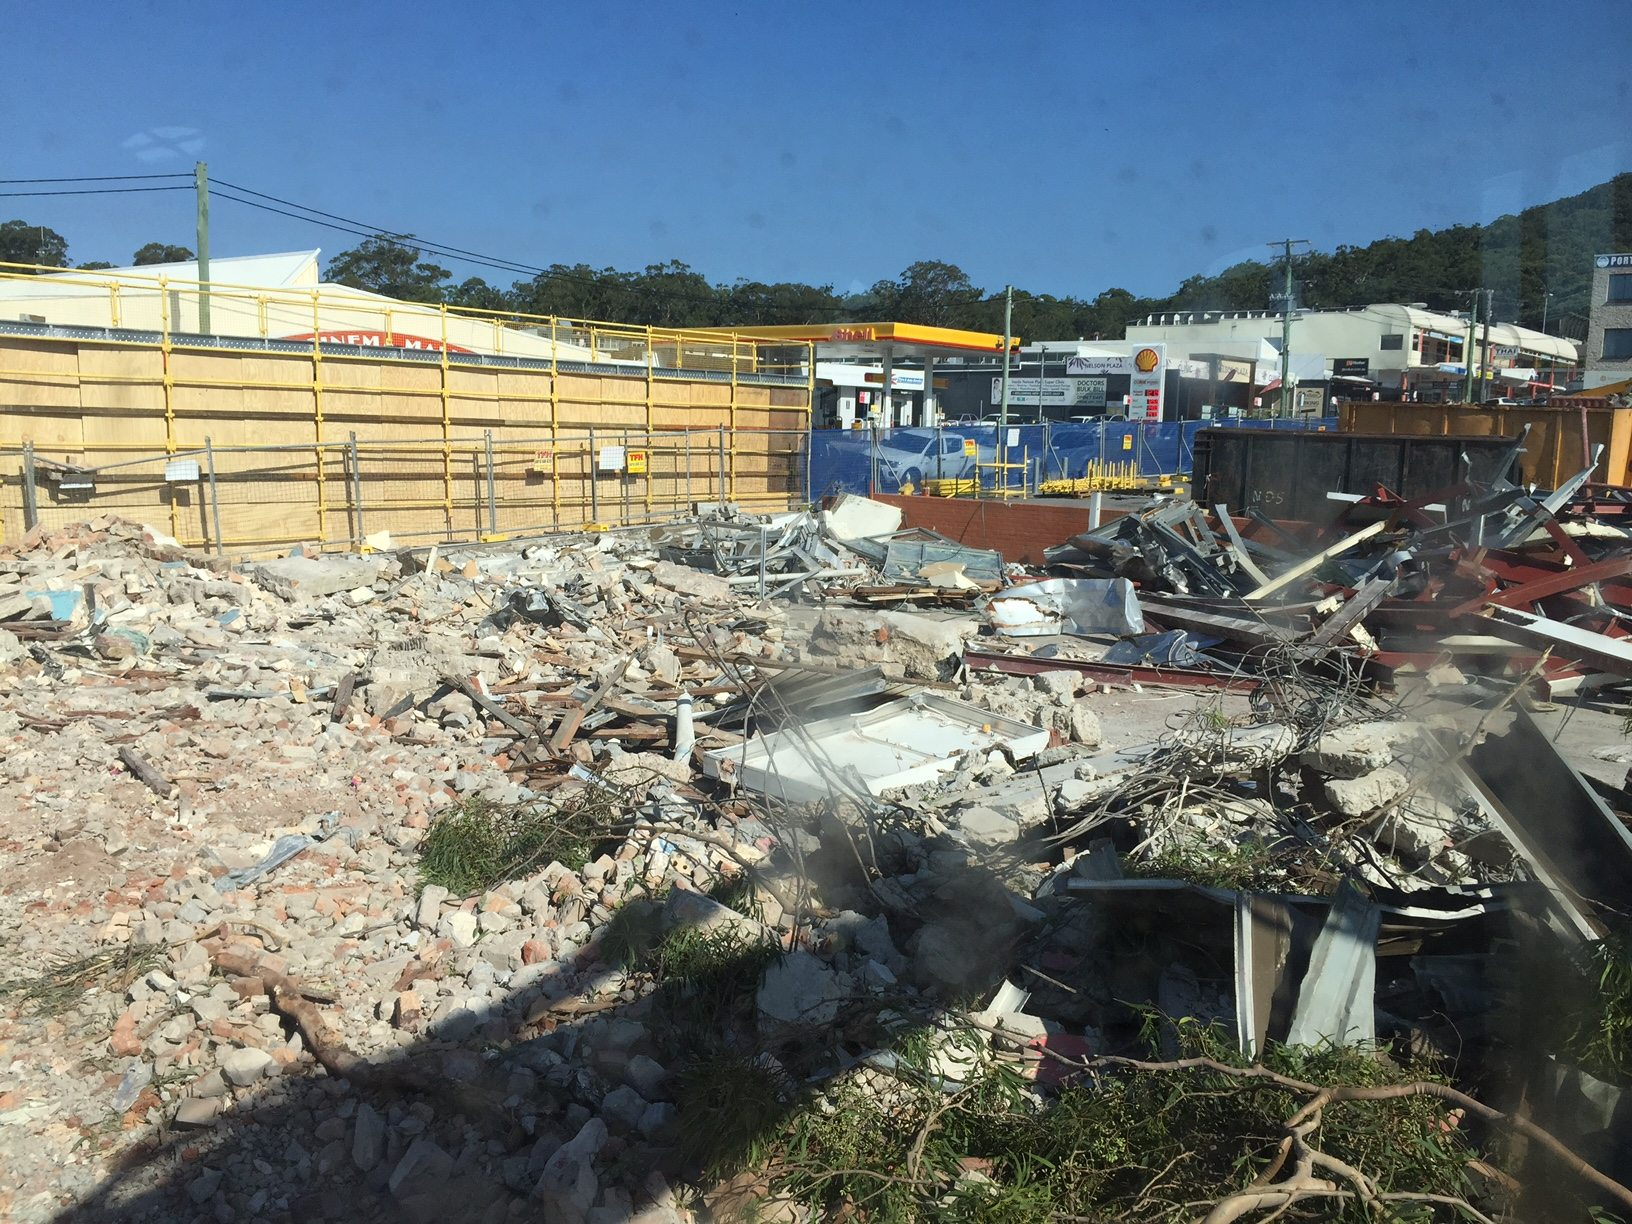 Industrial Demolition and Scrap Metal Salvage